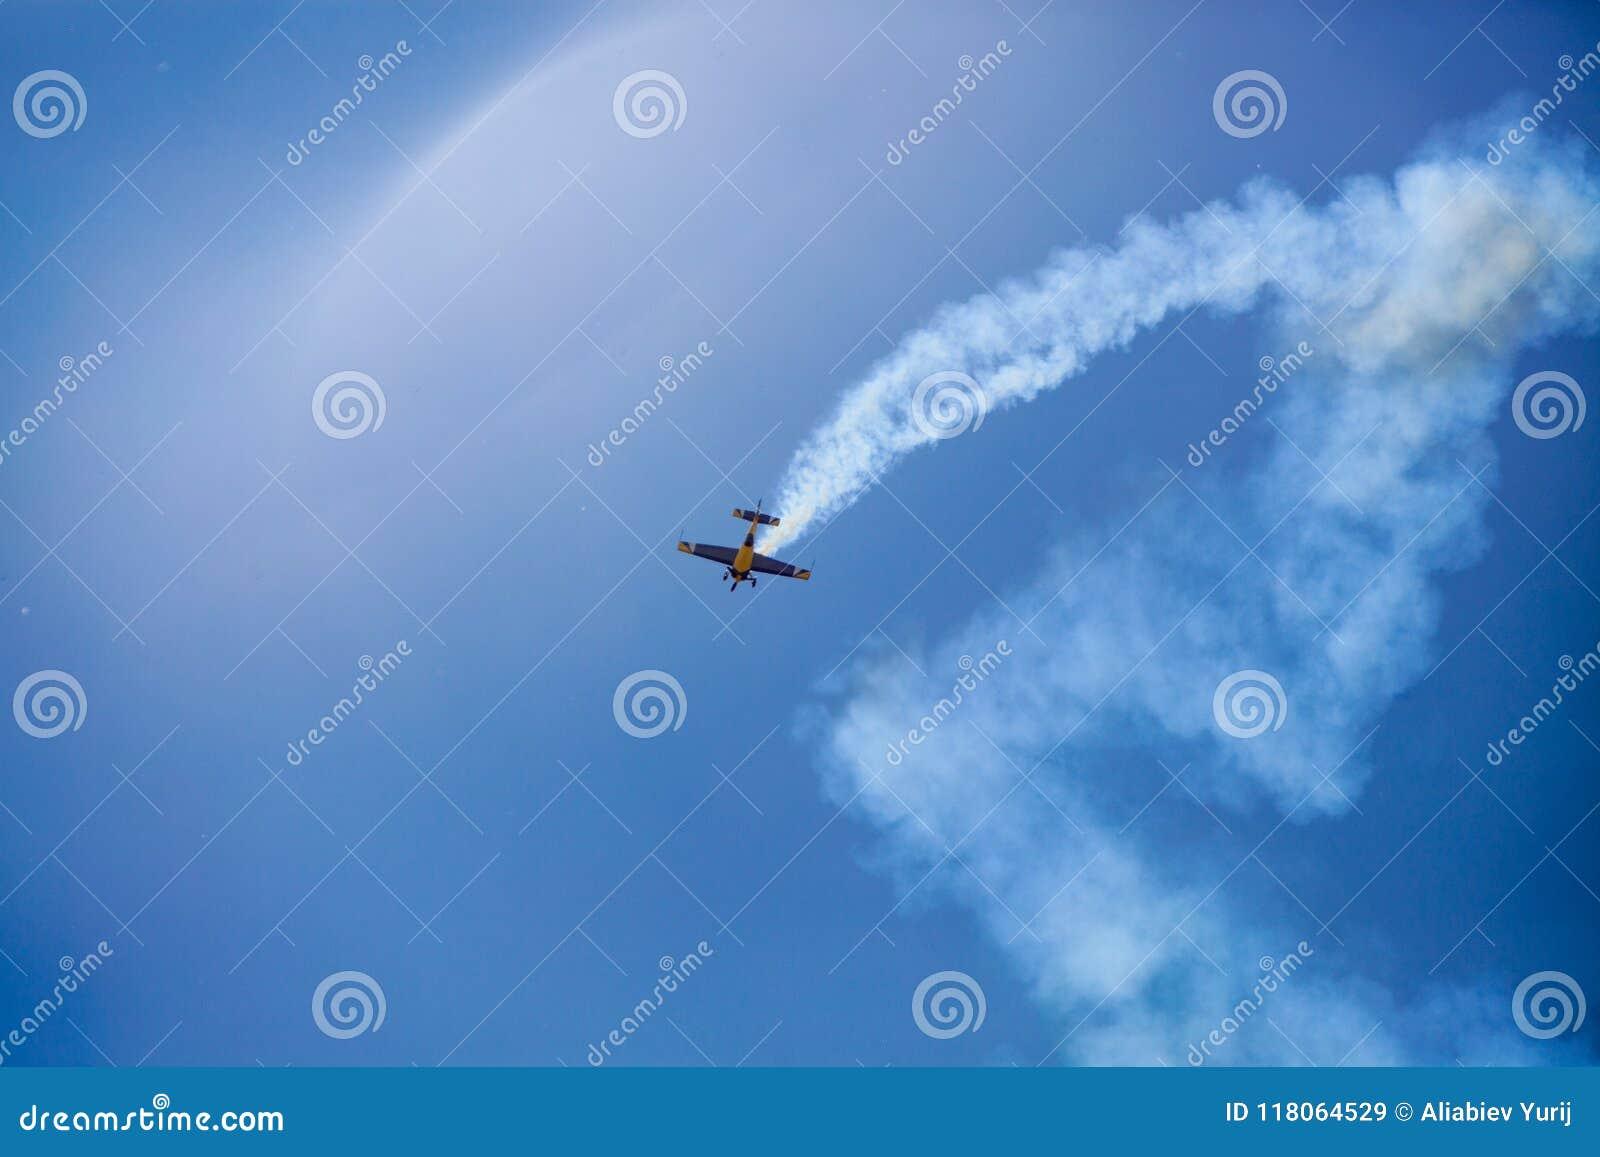 Aerobatics tricks show